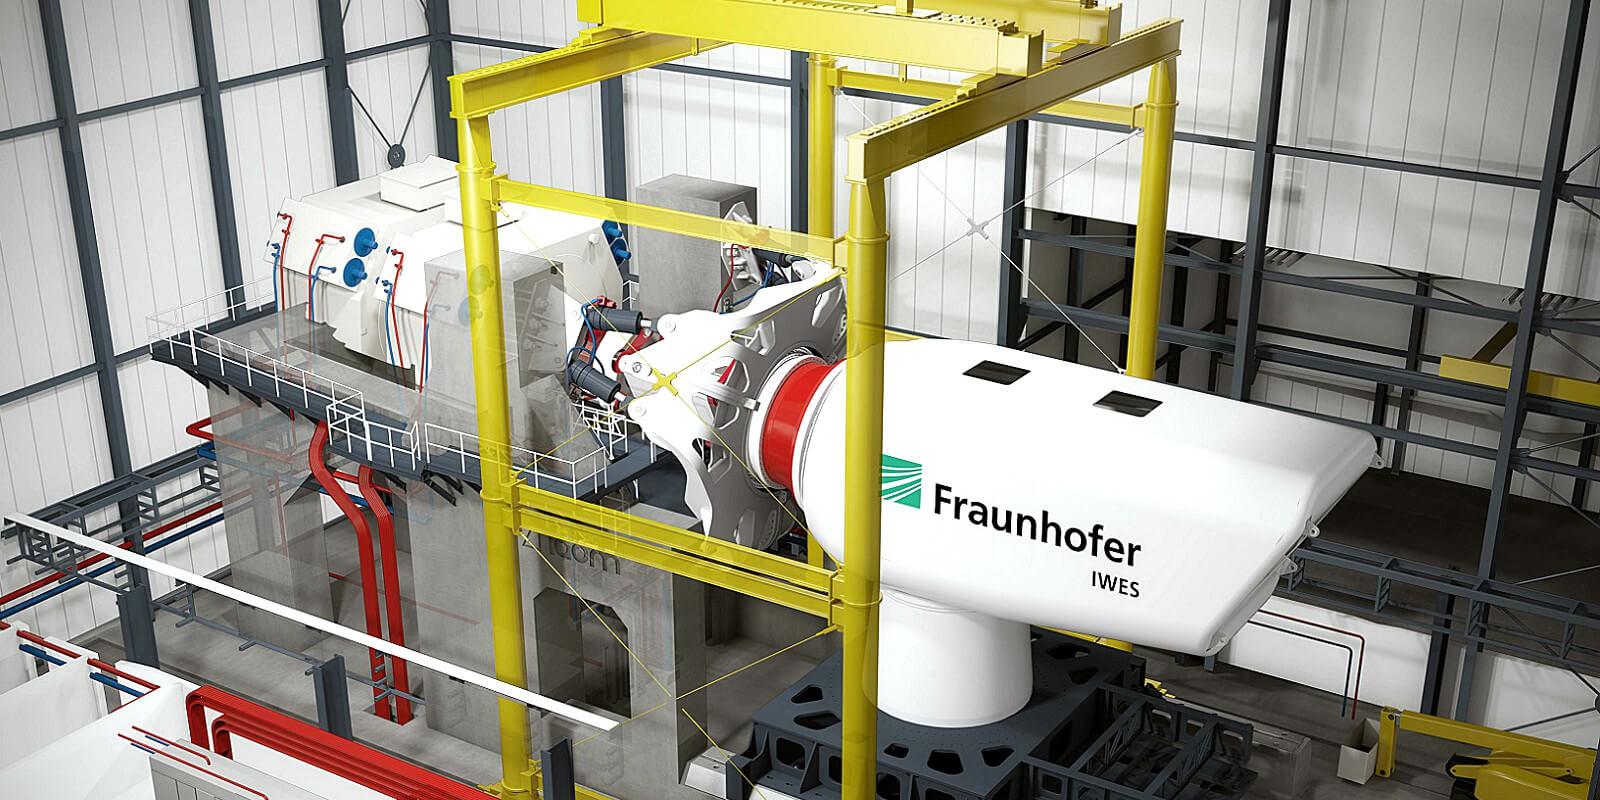 DyNaLab_Nacelle_Testing_Laboratory_Fraunhofer_IWES_Germany_Idom__4_